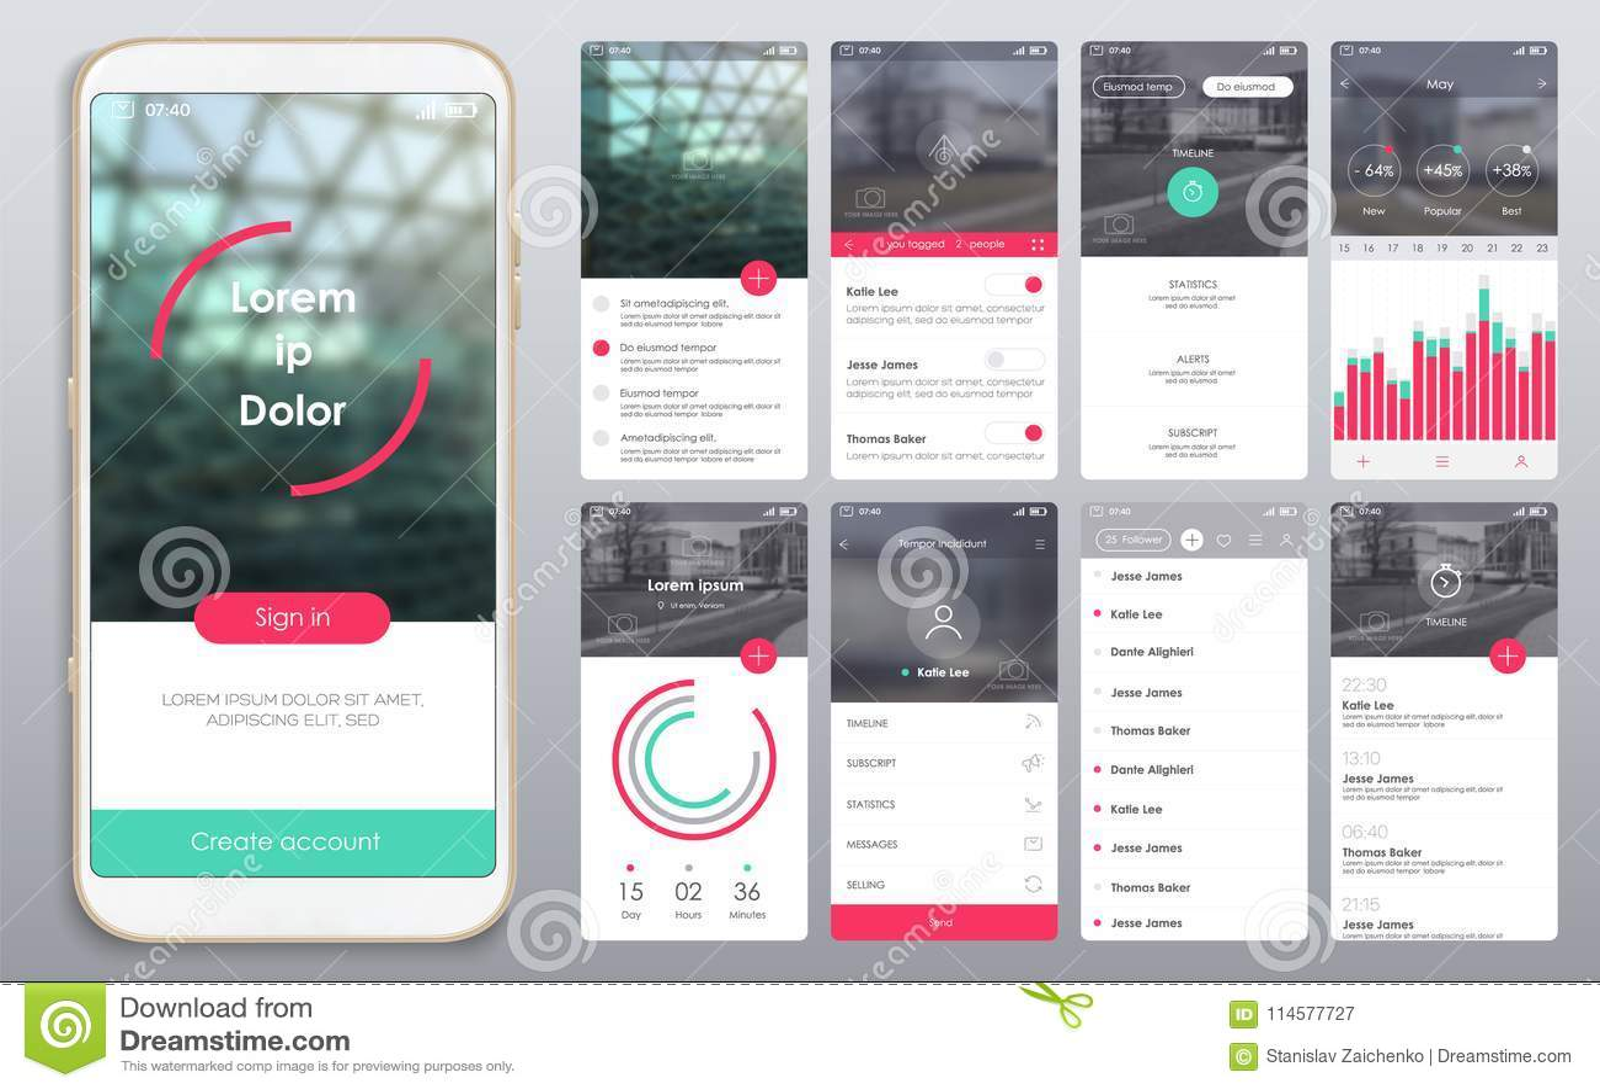 Ontwerp van de mobiele toepassing, UI, UX, GUI